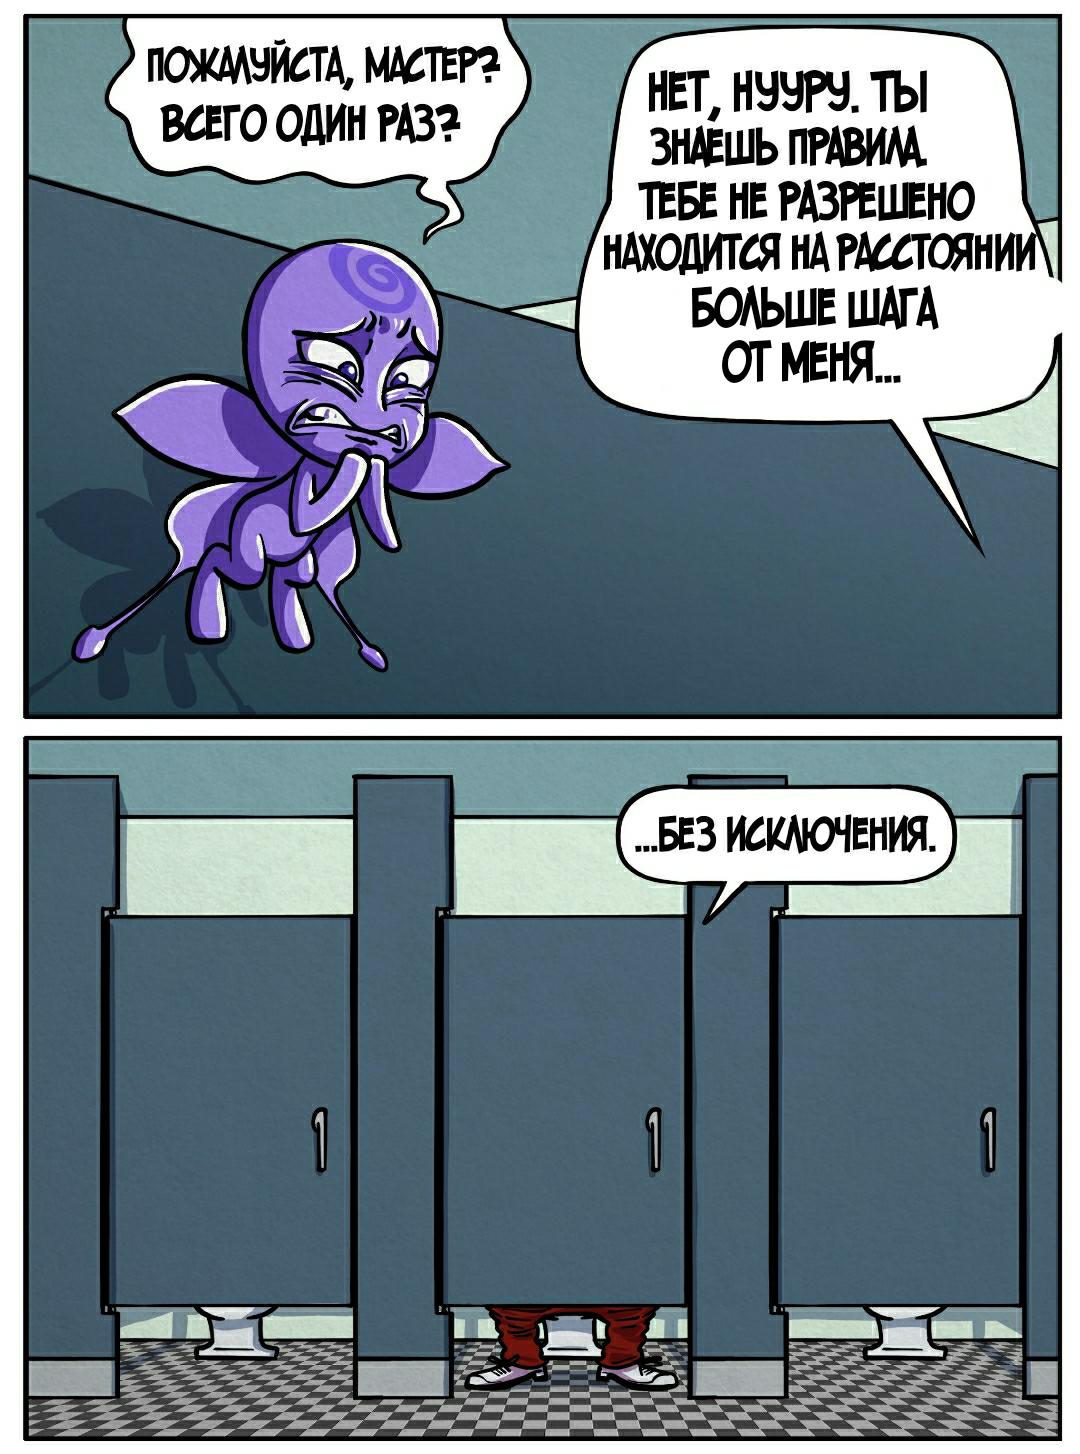 Комикс Леди Баг и Супер Кот Будни Бражника. Нууру 1-1